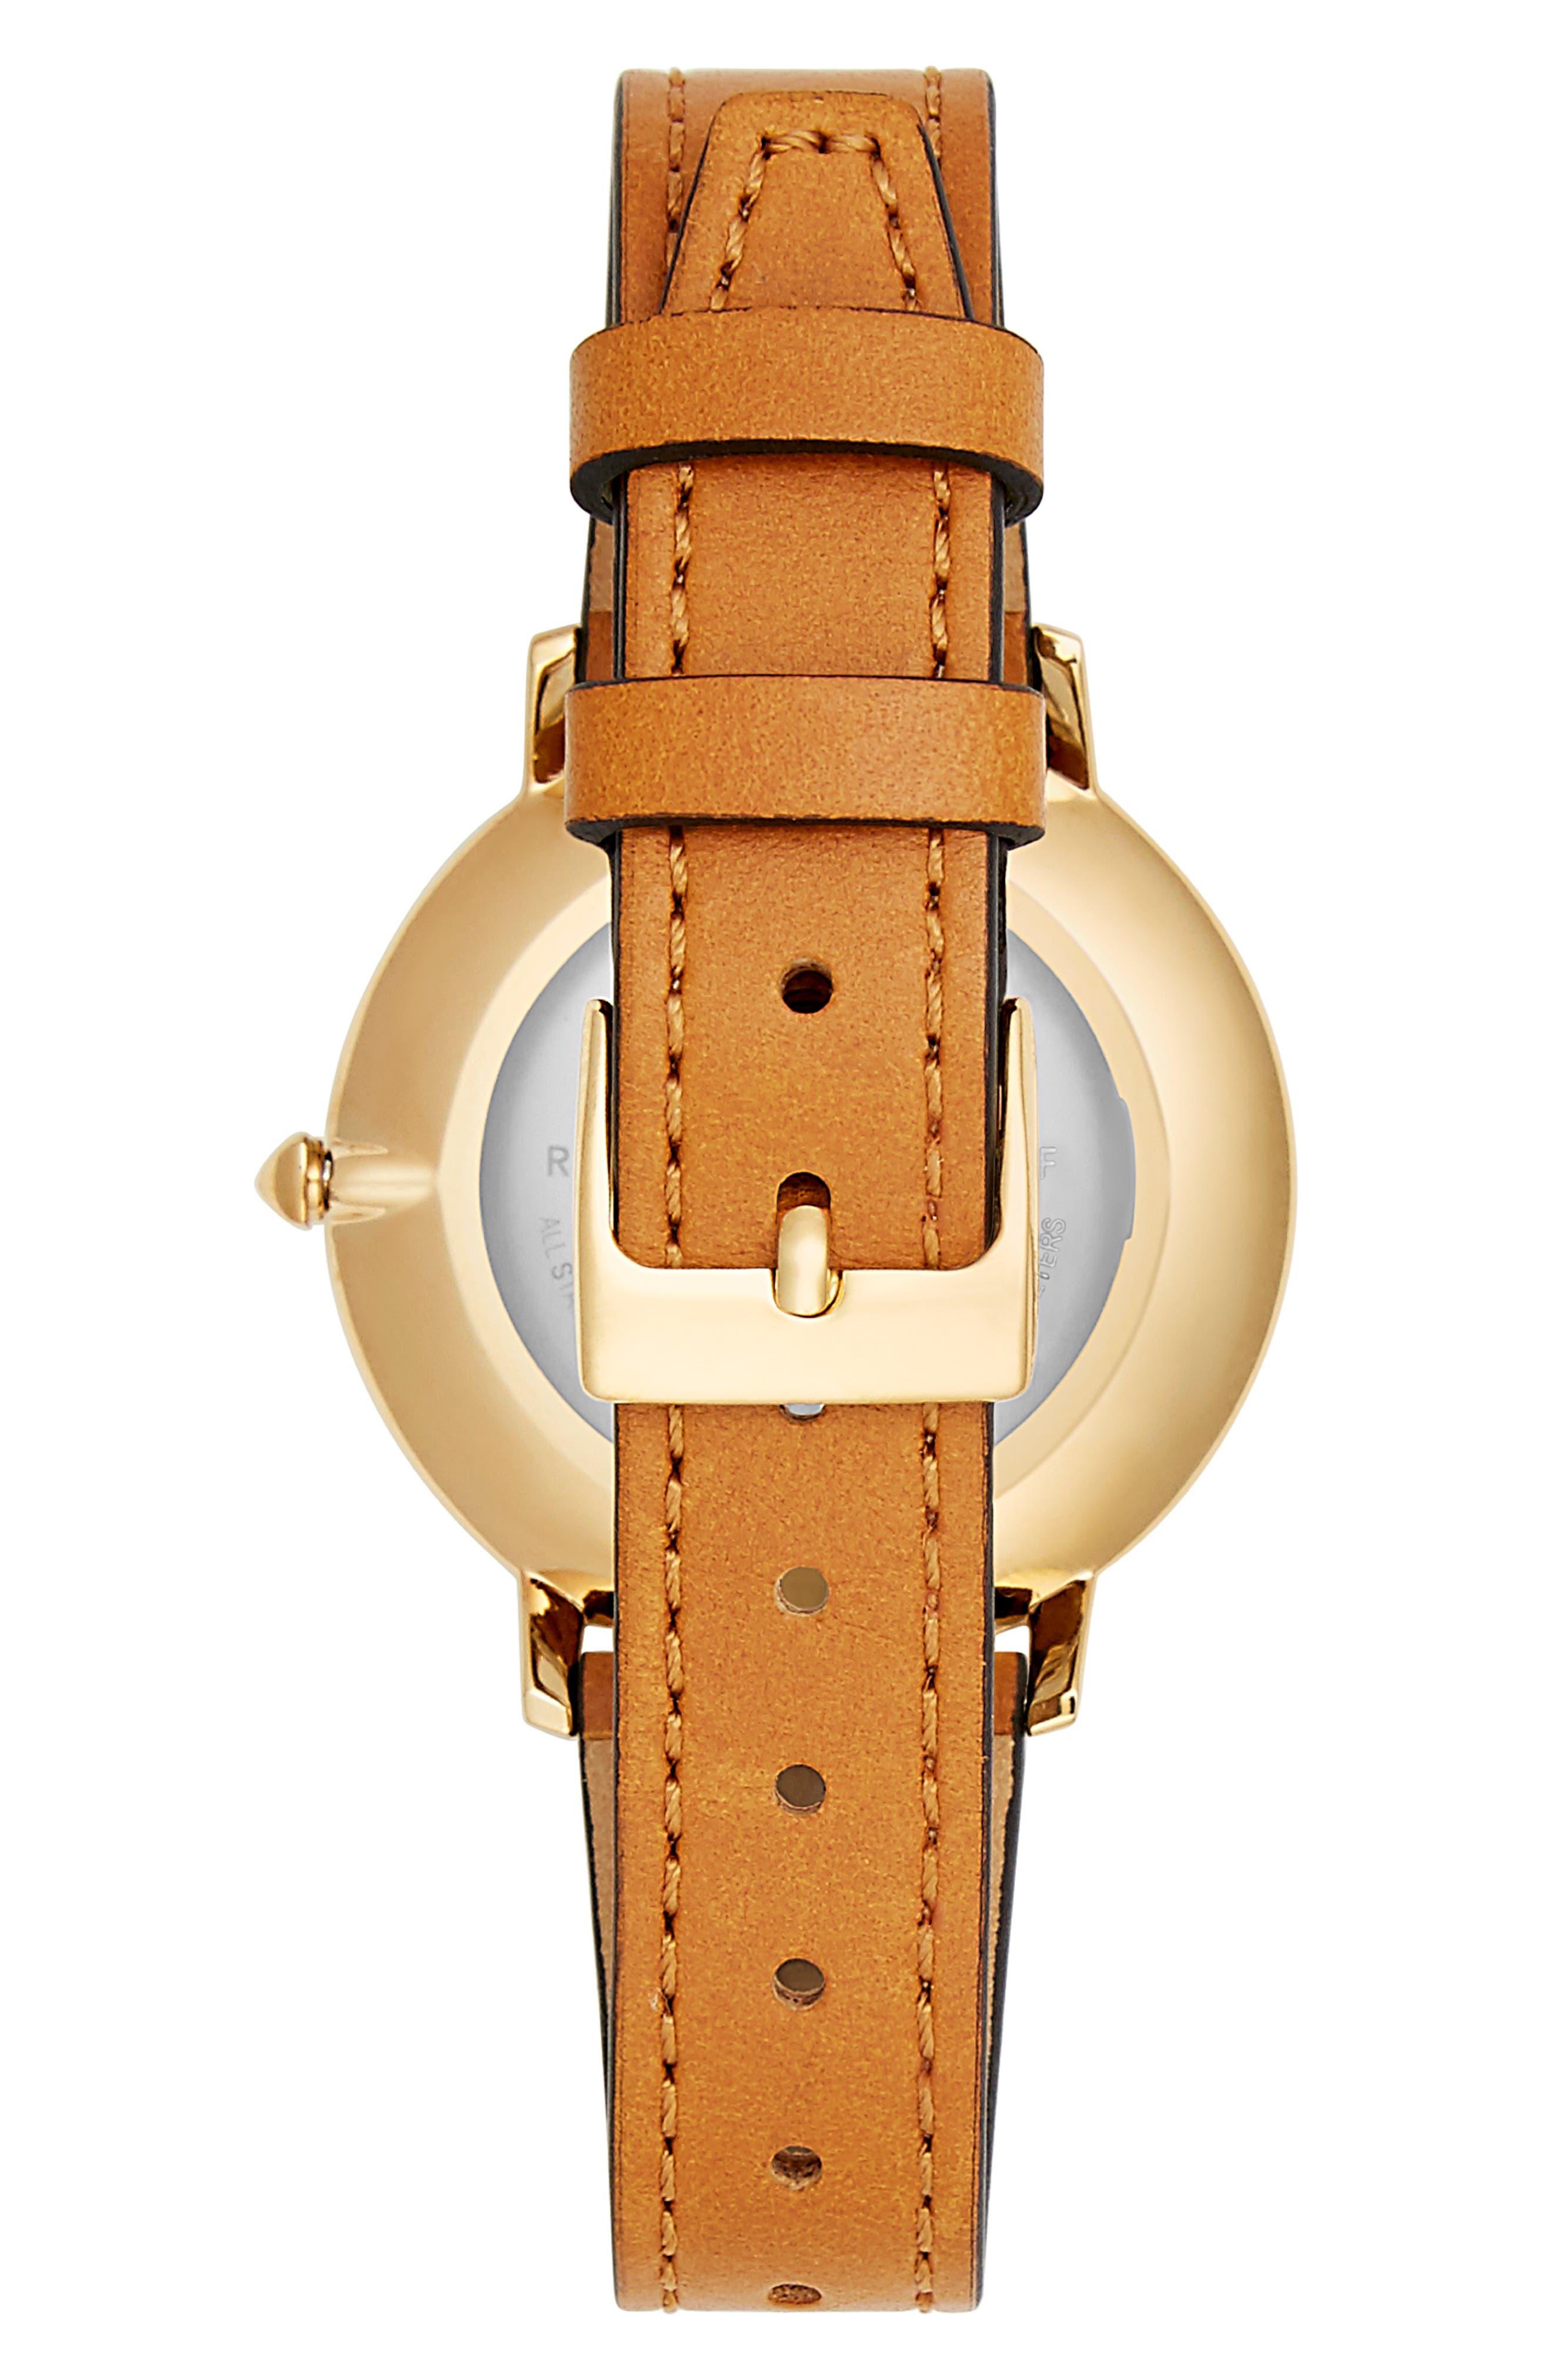 REBECCA MINKOFF,                             Rebeca Minkoff Major GRL PWR Leather Strap Watch, 35mm,                             Alternate thumbnail 2, color,                             200